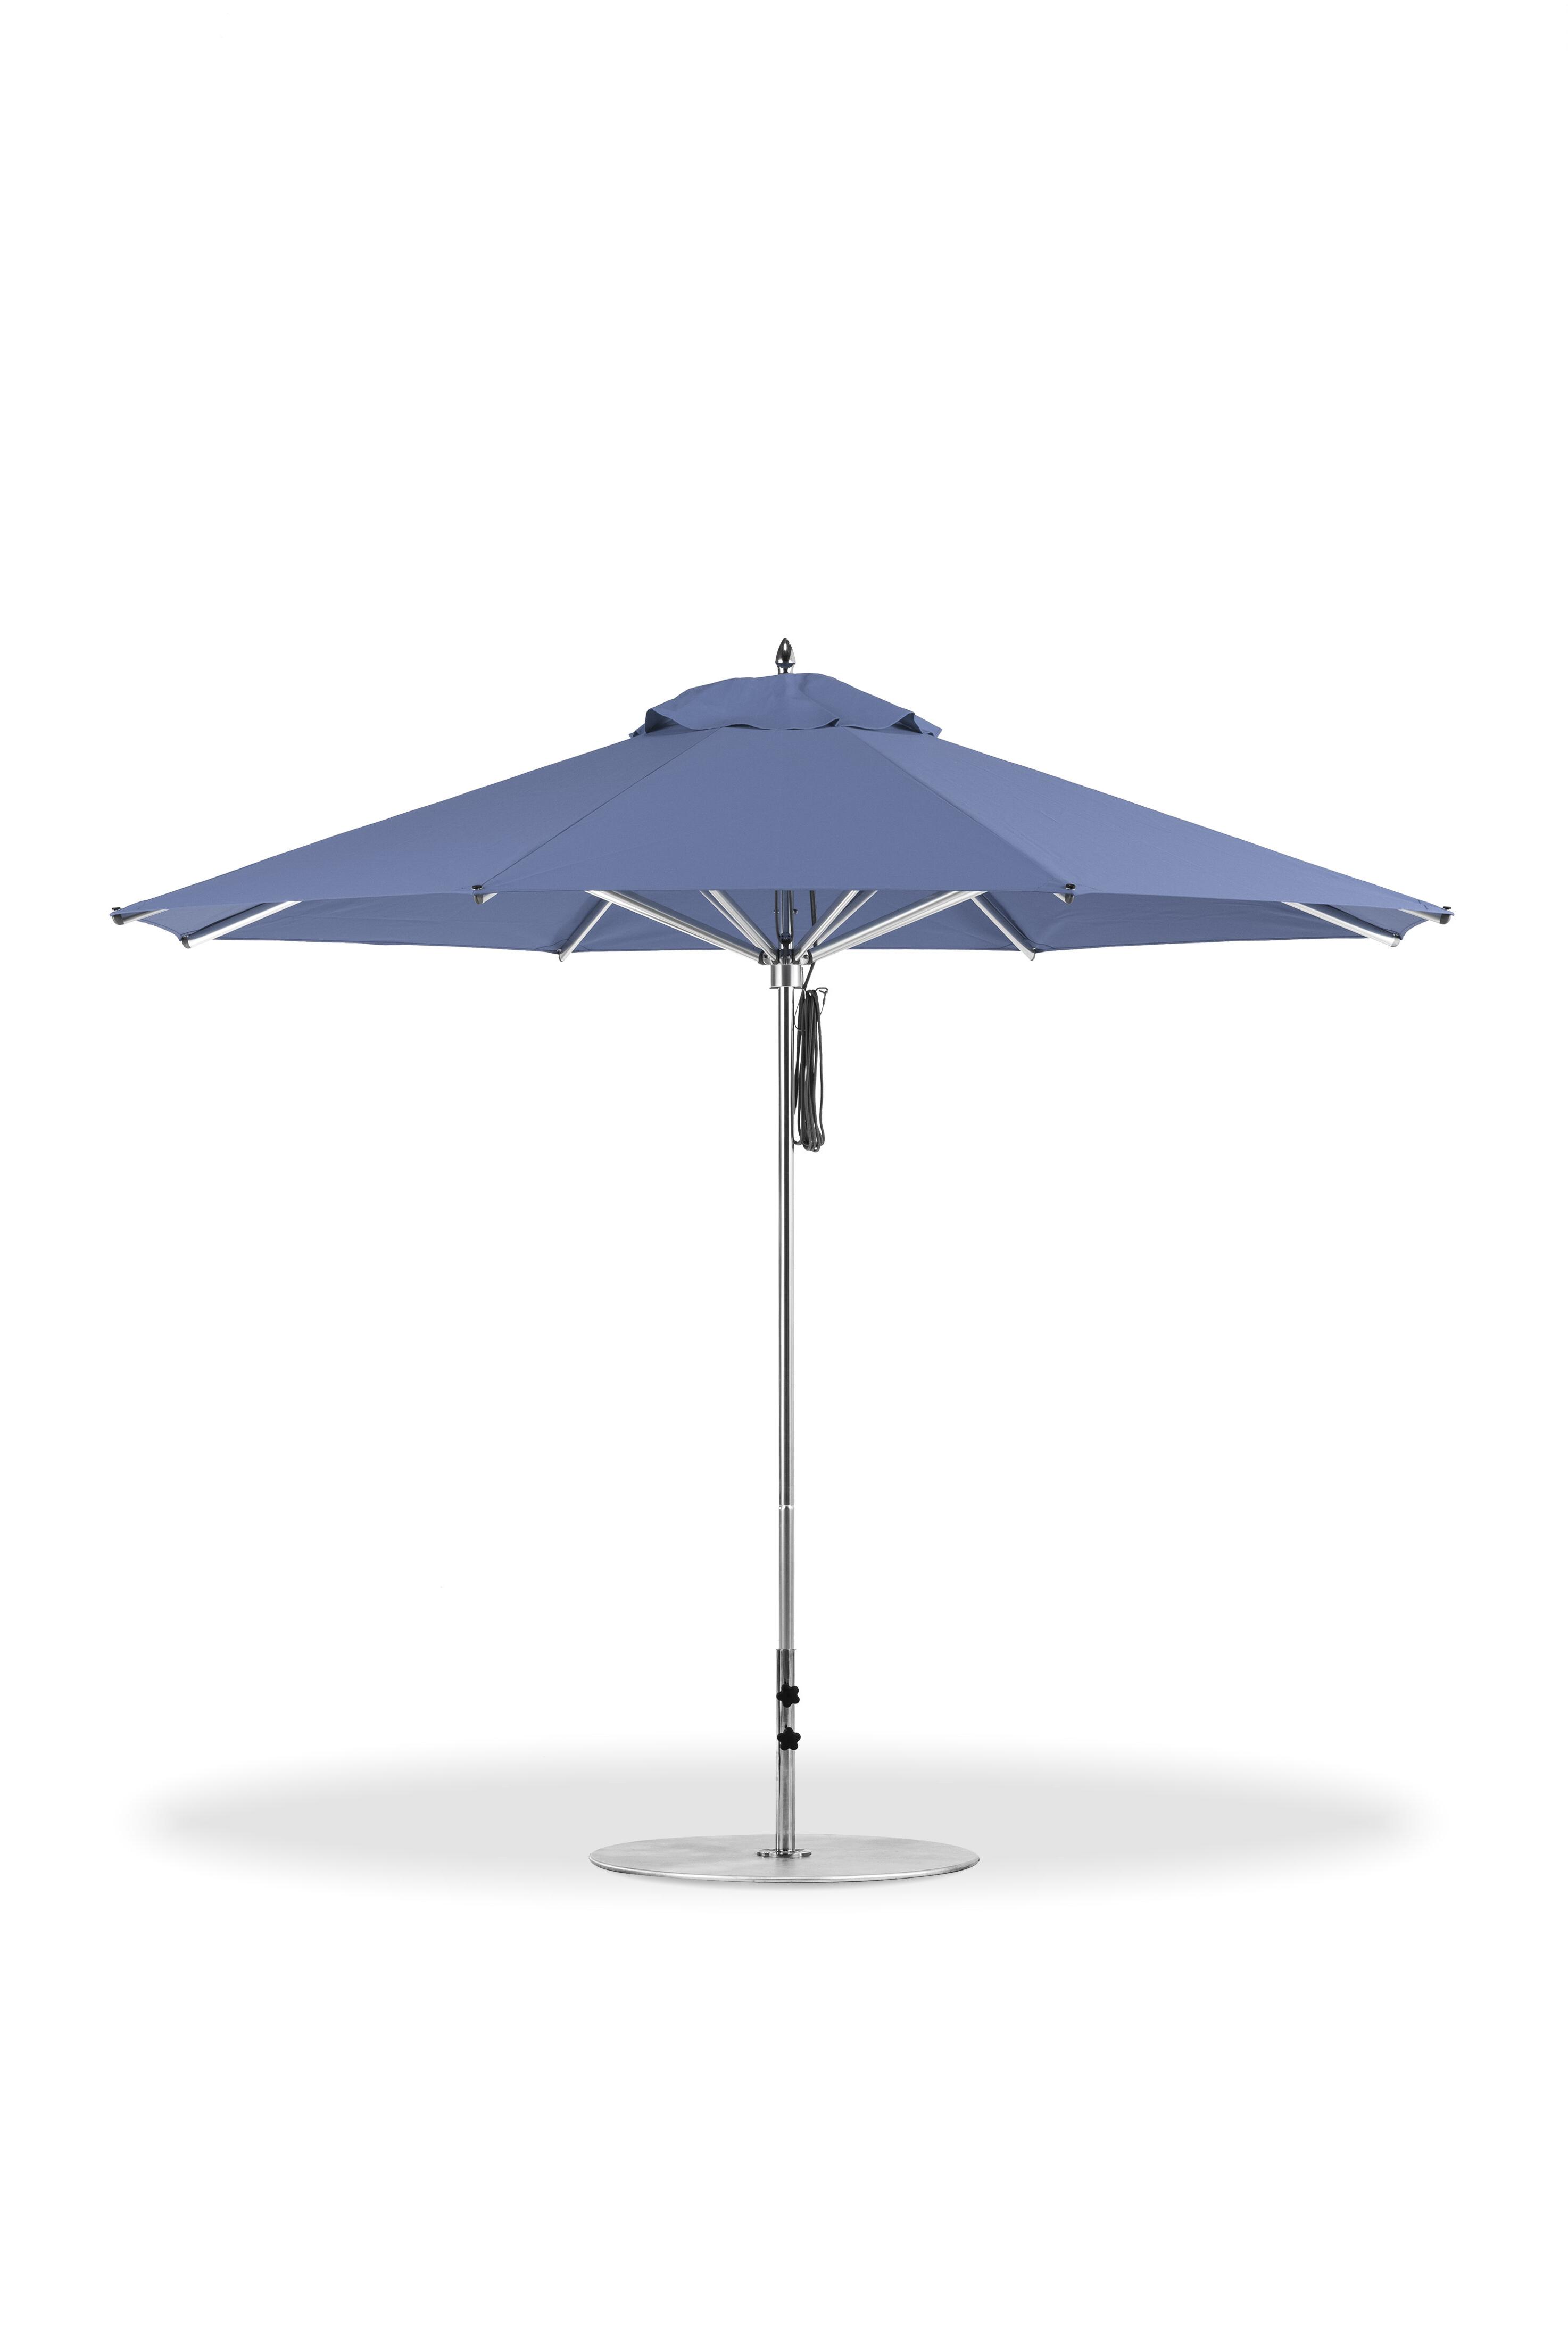 Recent Zeman Market Umbrellas Throughout Criddle 11' Market Umbrella (View 10 of 20)